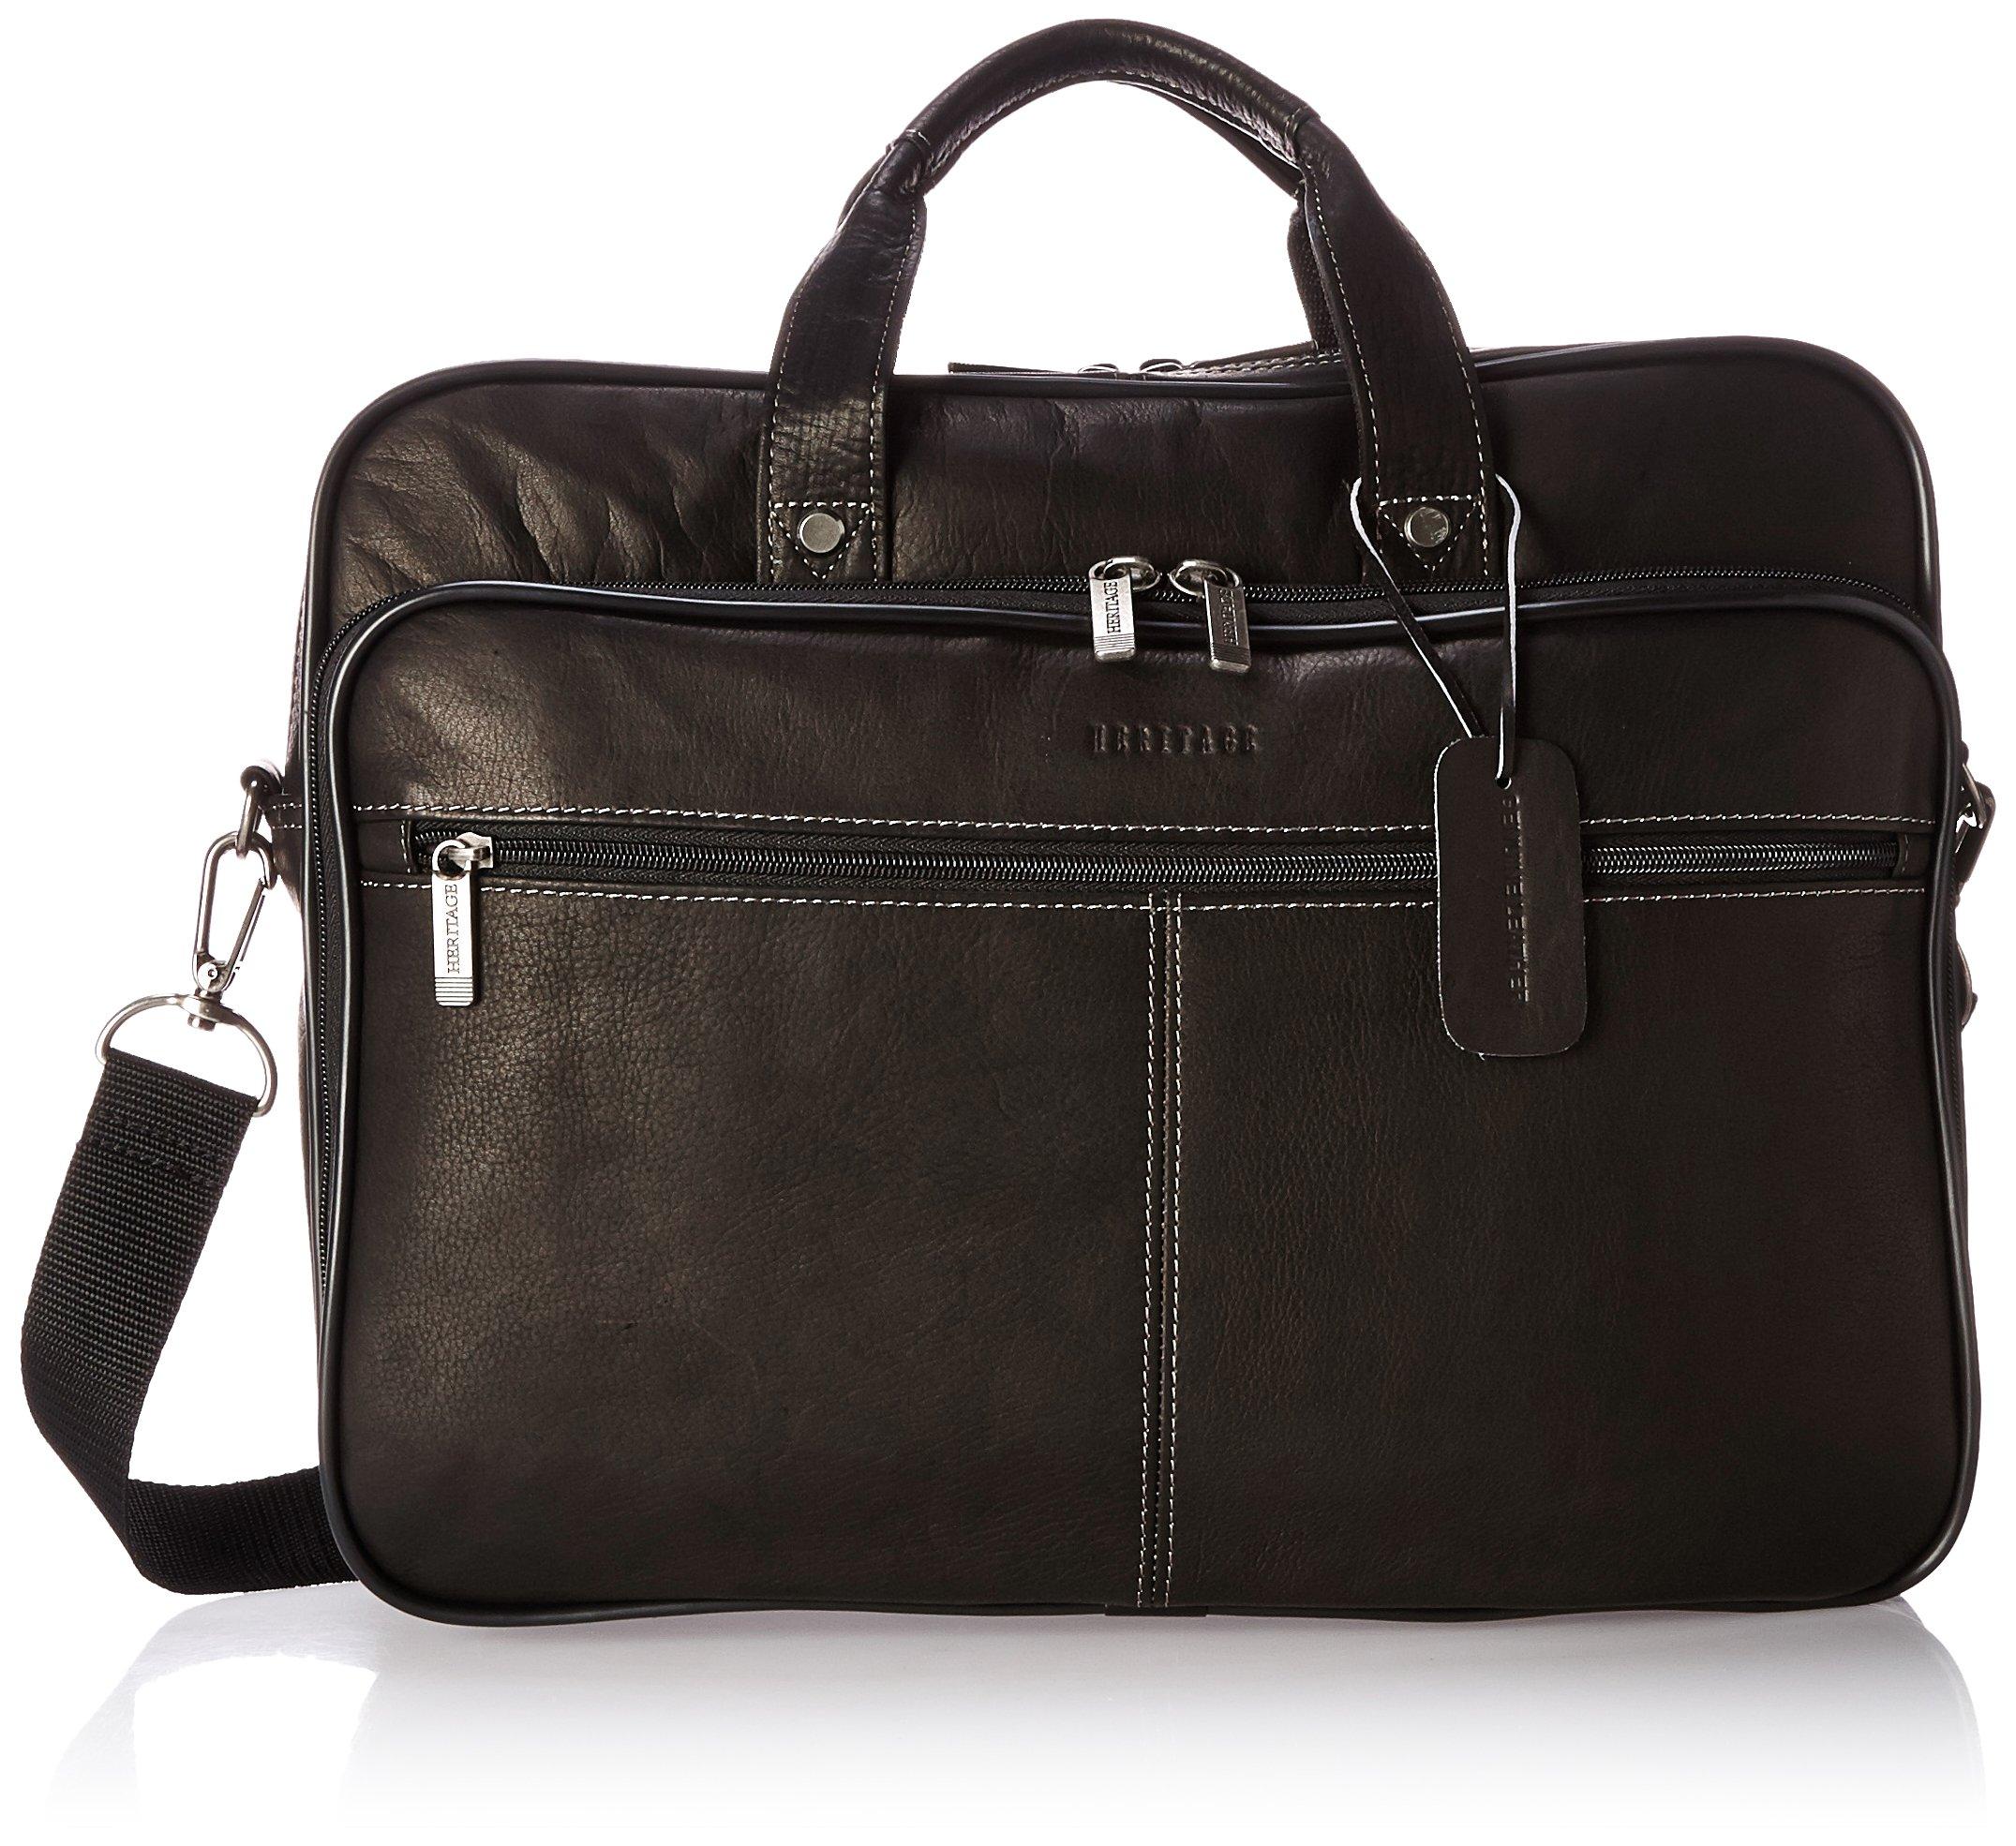 Heritage Travelware Colombian Leather Dual Compartment Top Zip 16'' Laptop Portfolio, Black